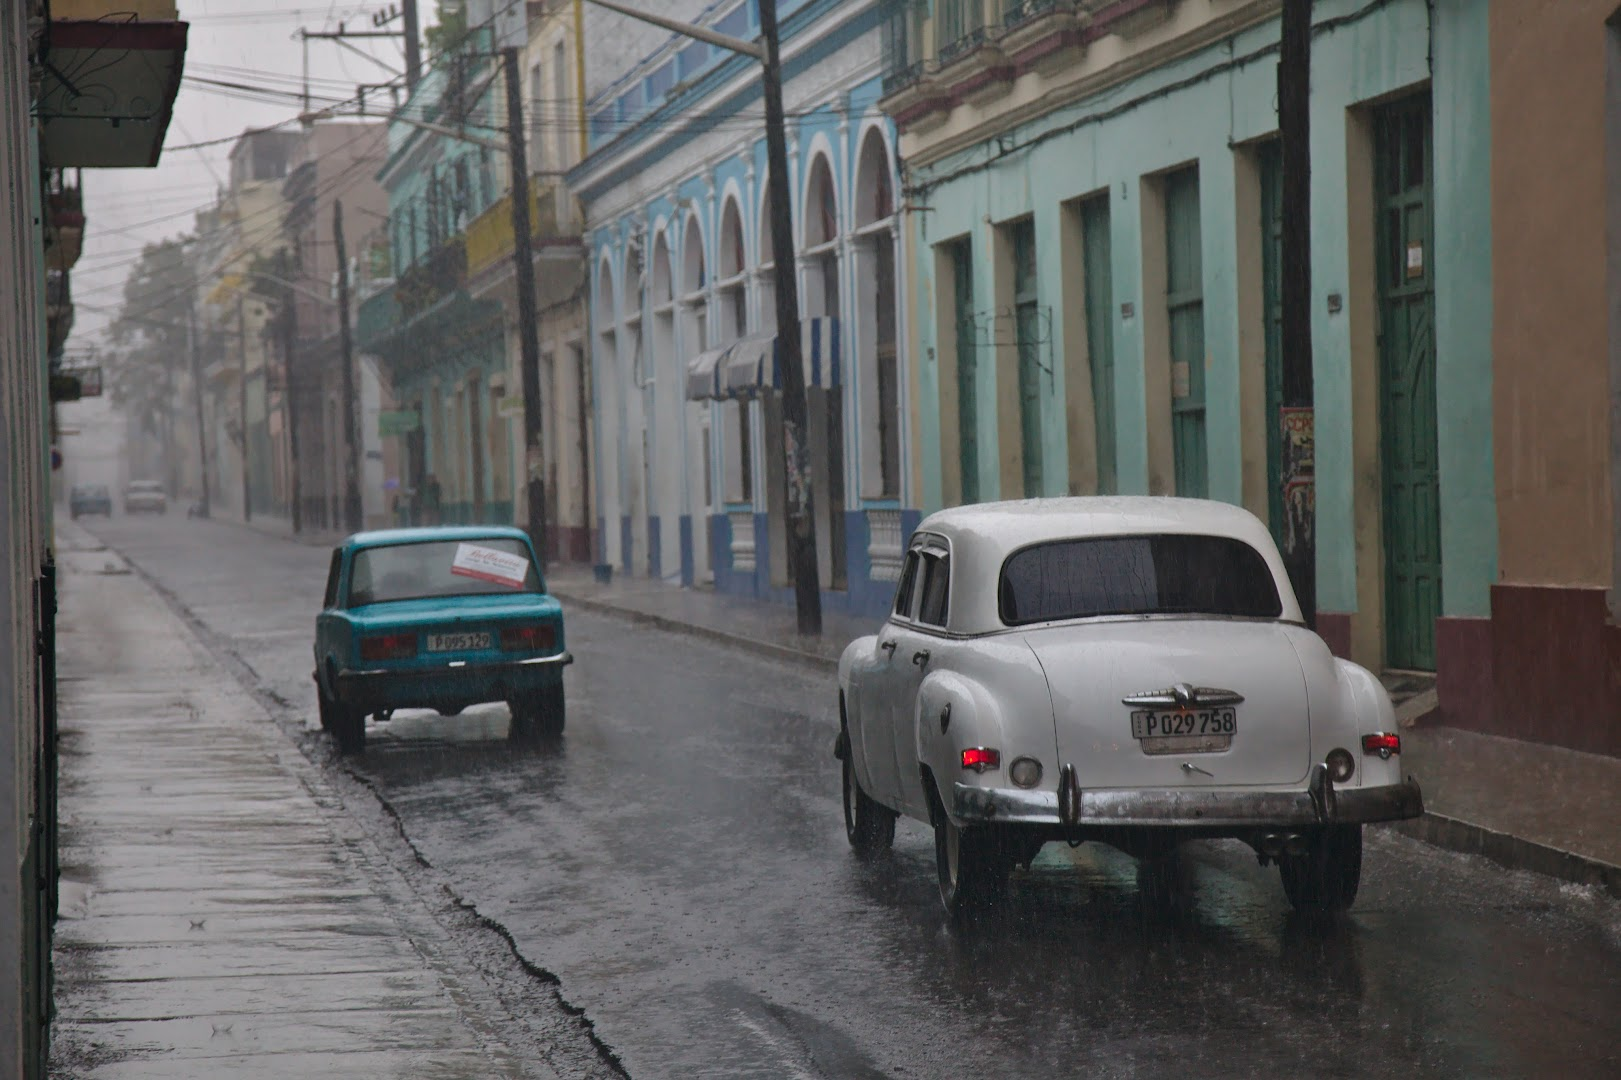 June is a rainy season in the Caribbean